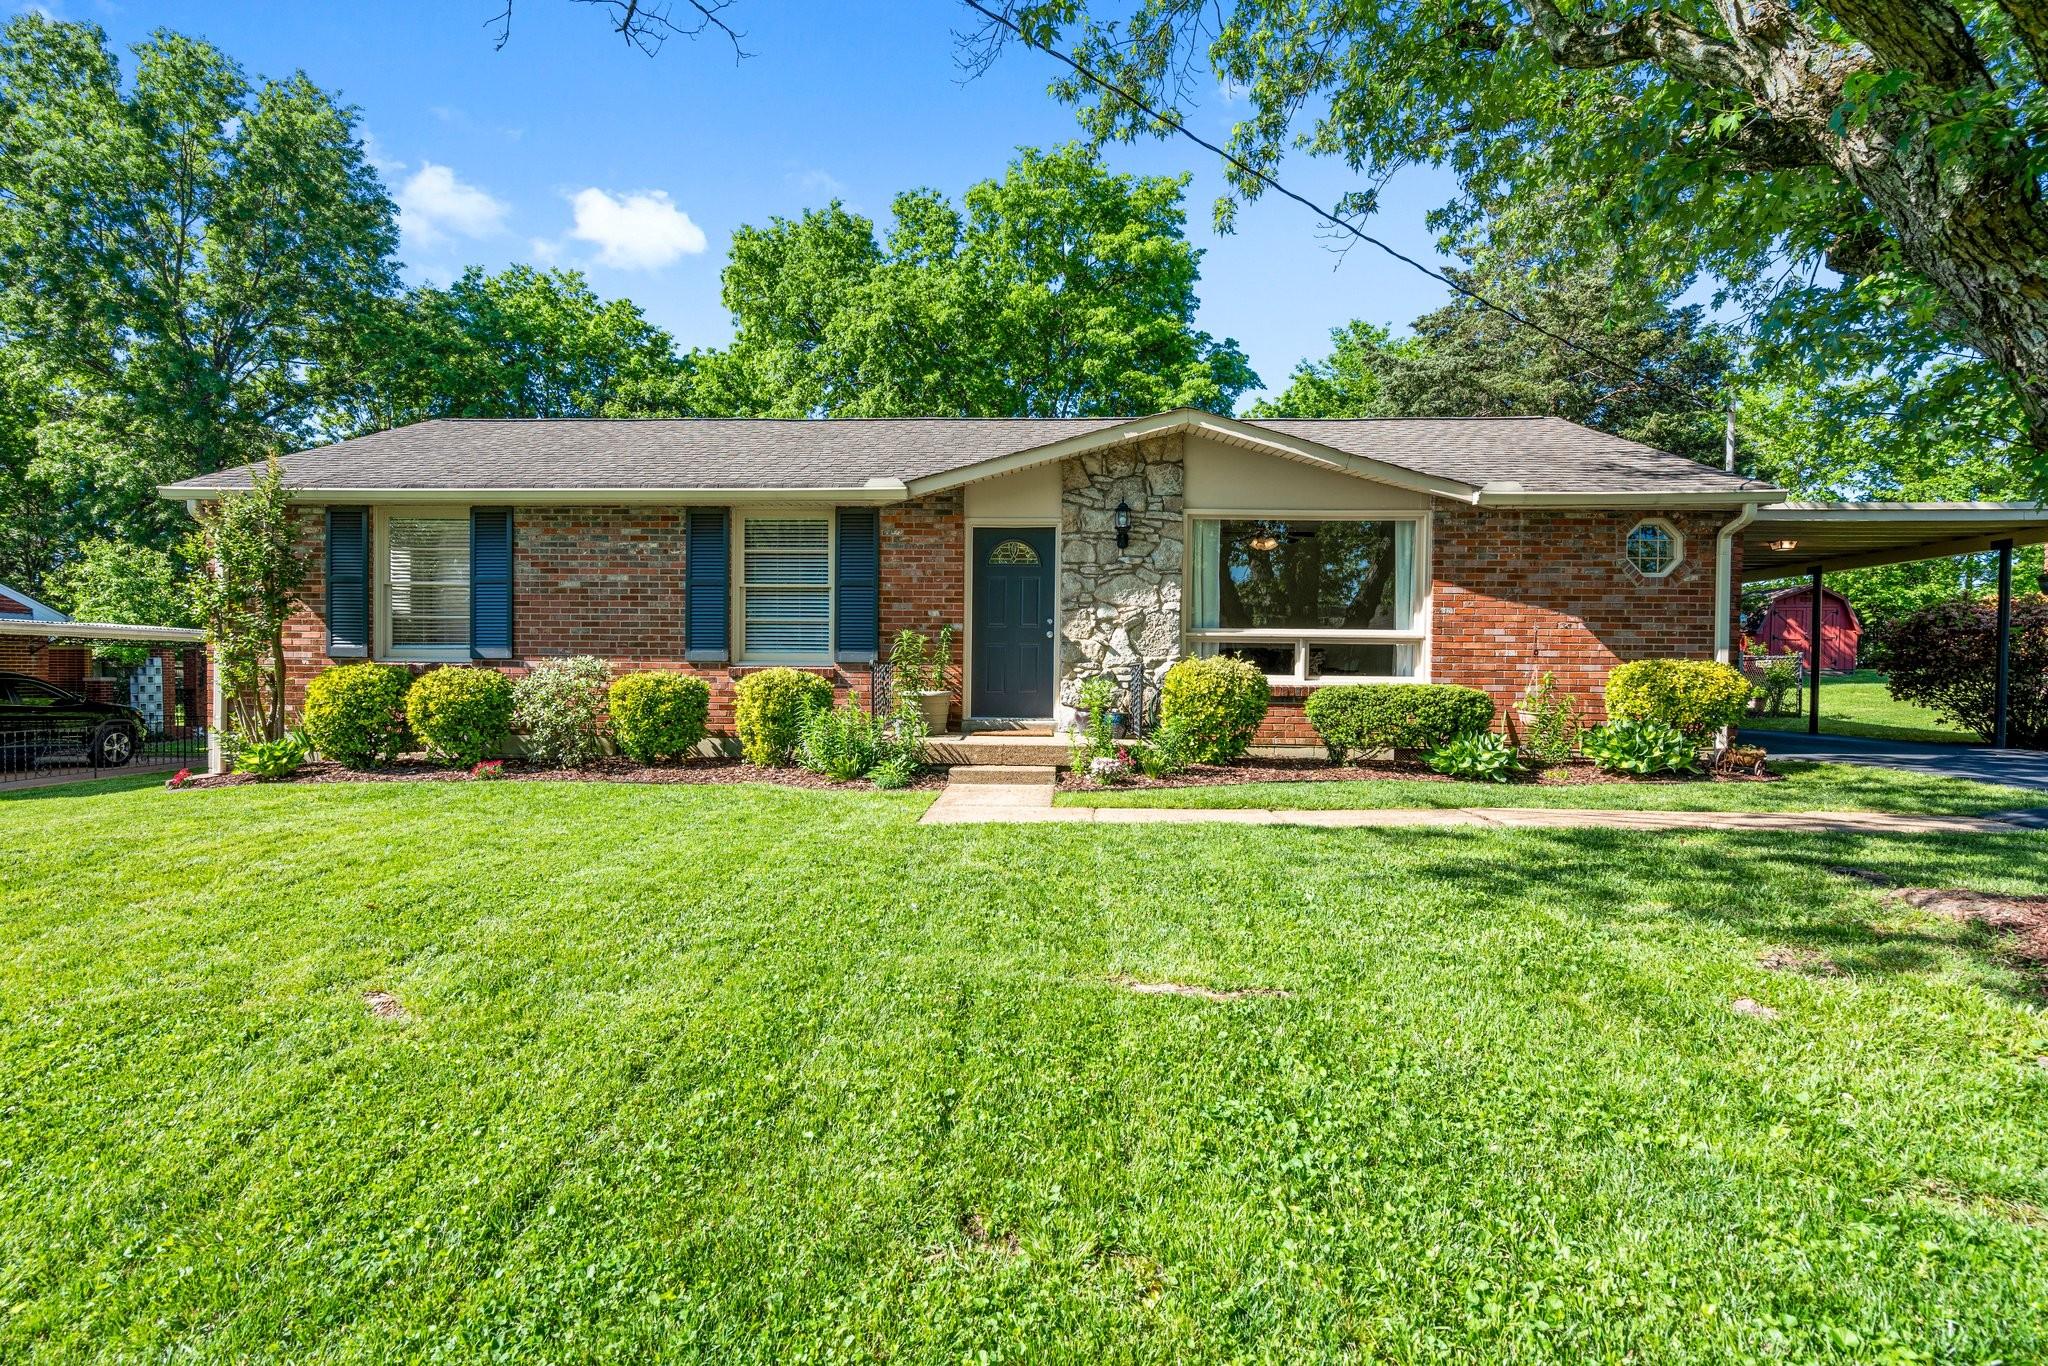 623 Elaine Dr Property Photo - Nashville, TN real estate listing